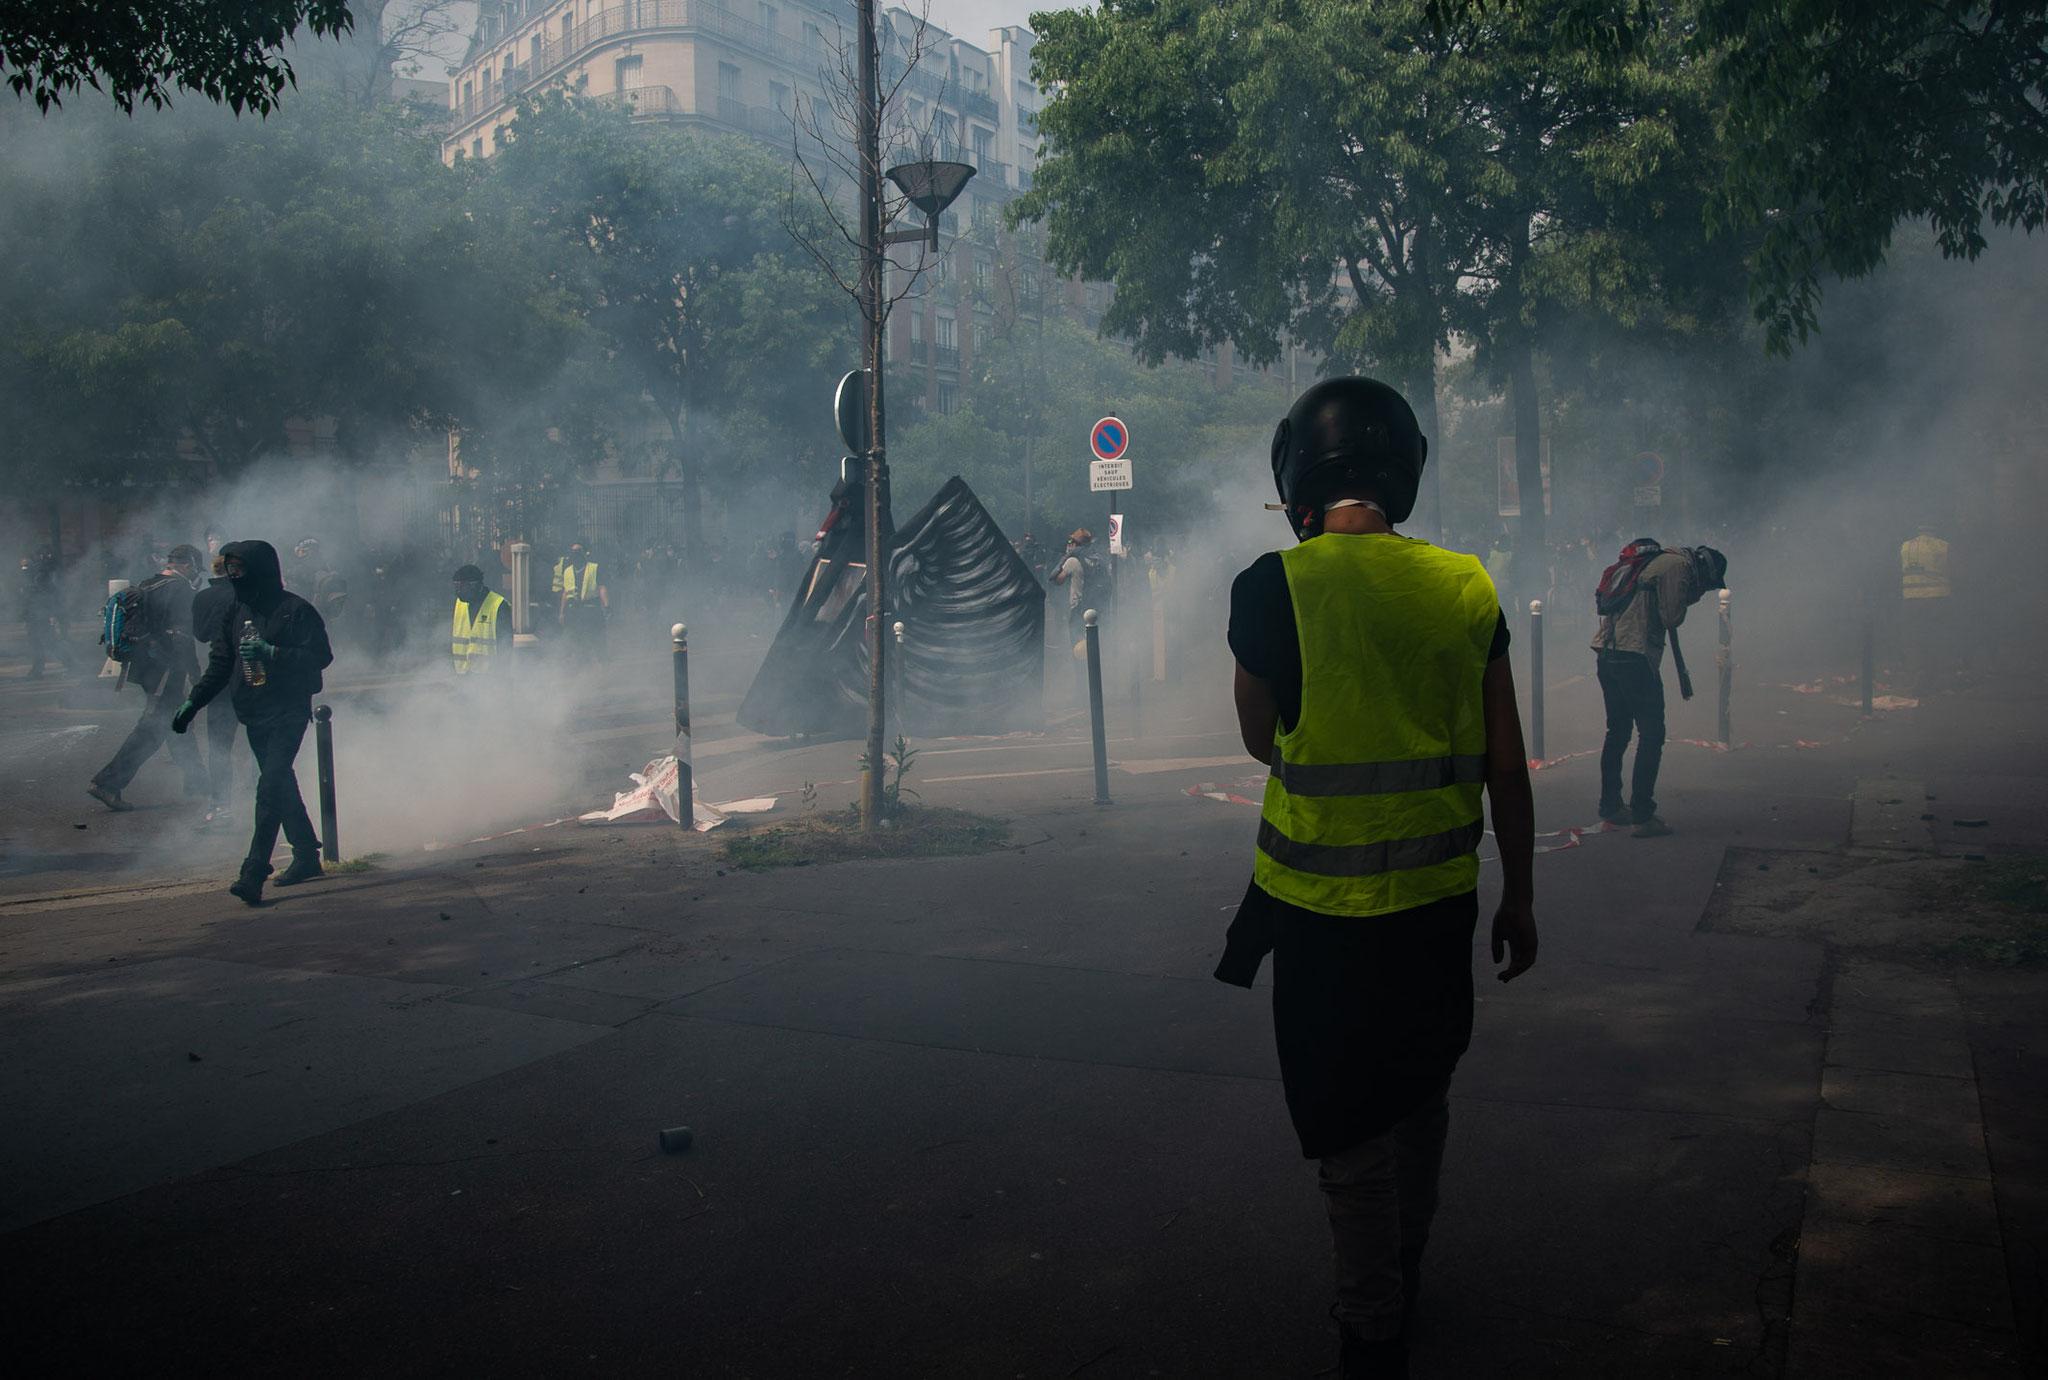 Manifestation Parisienne du Premier Mai 2019